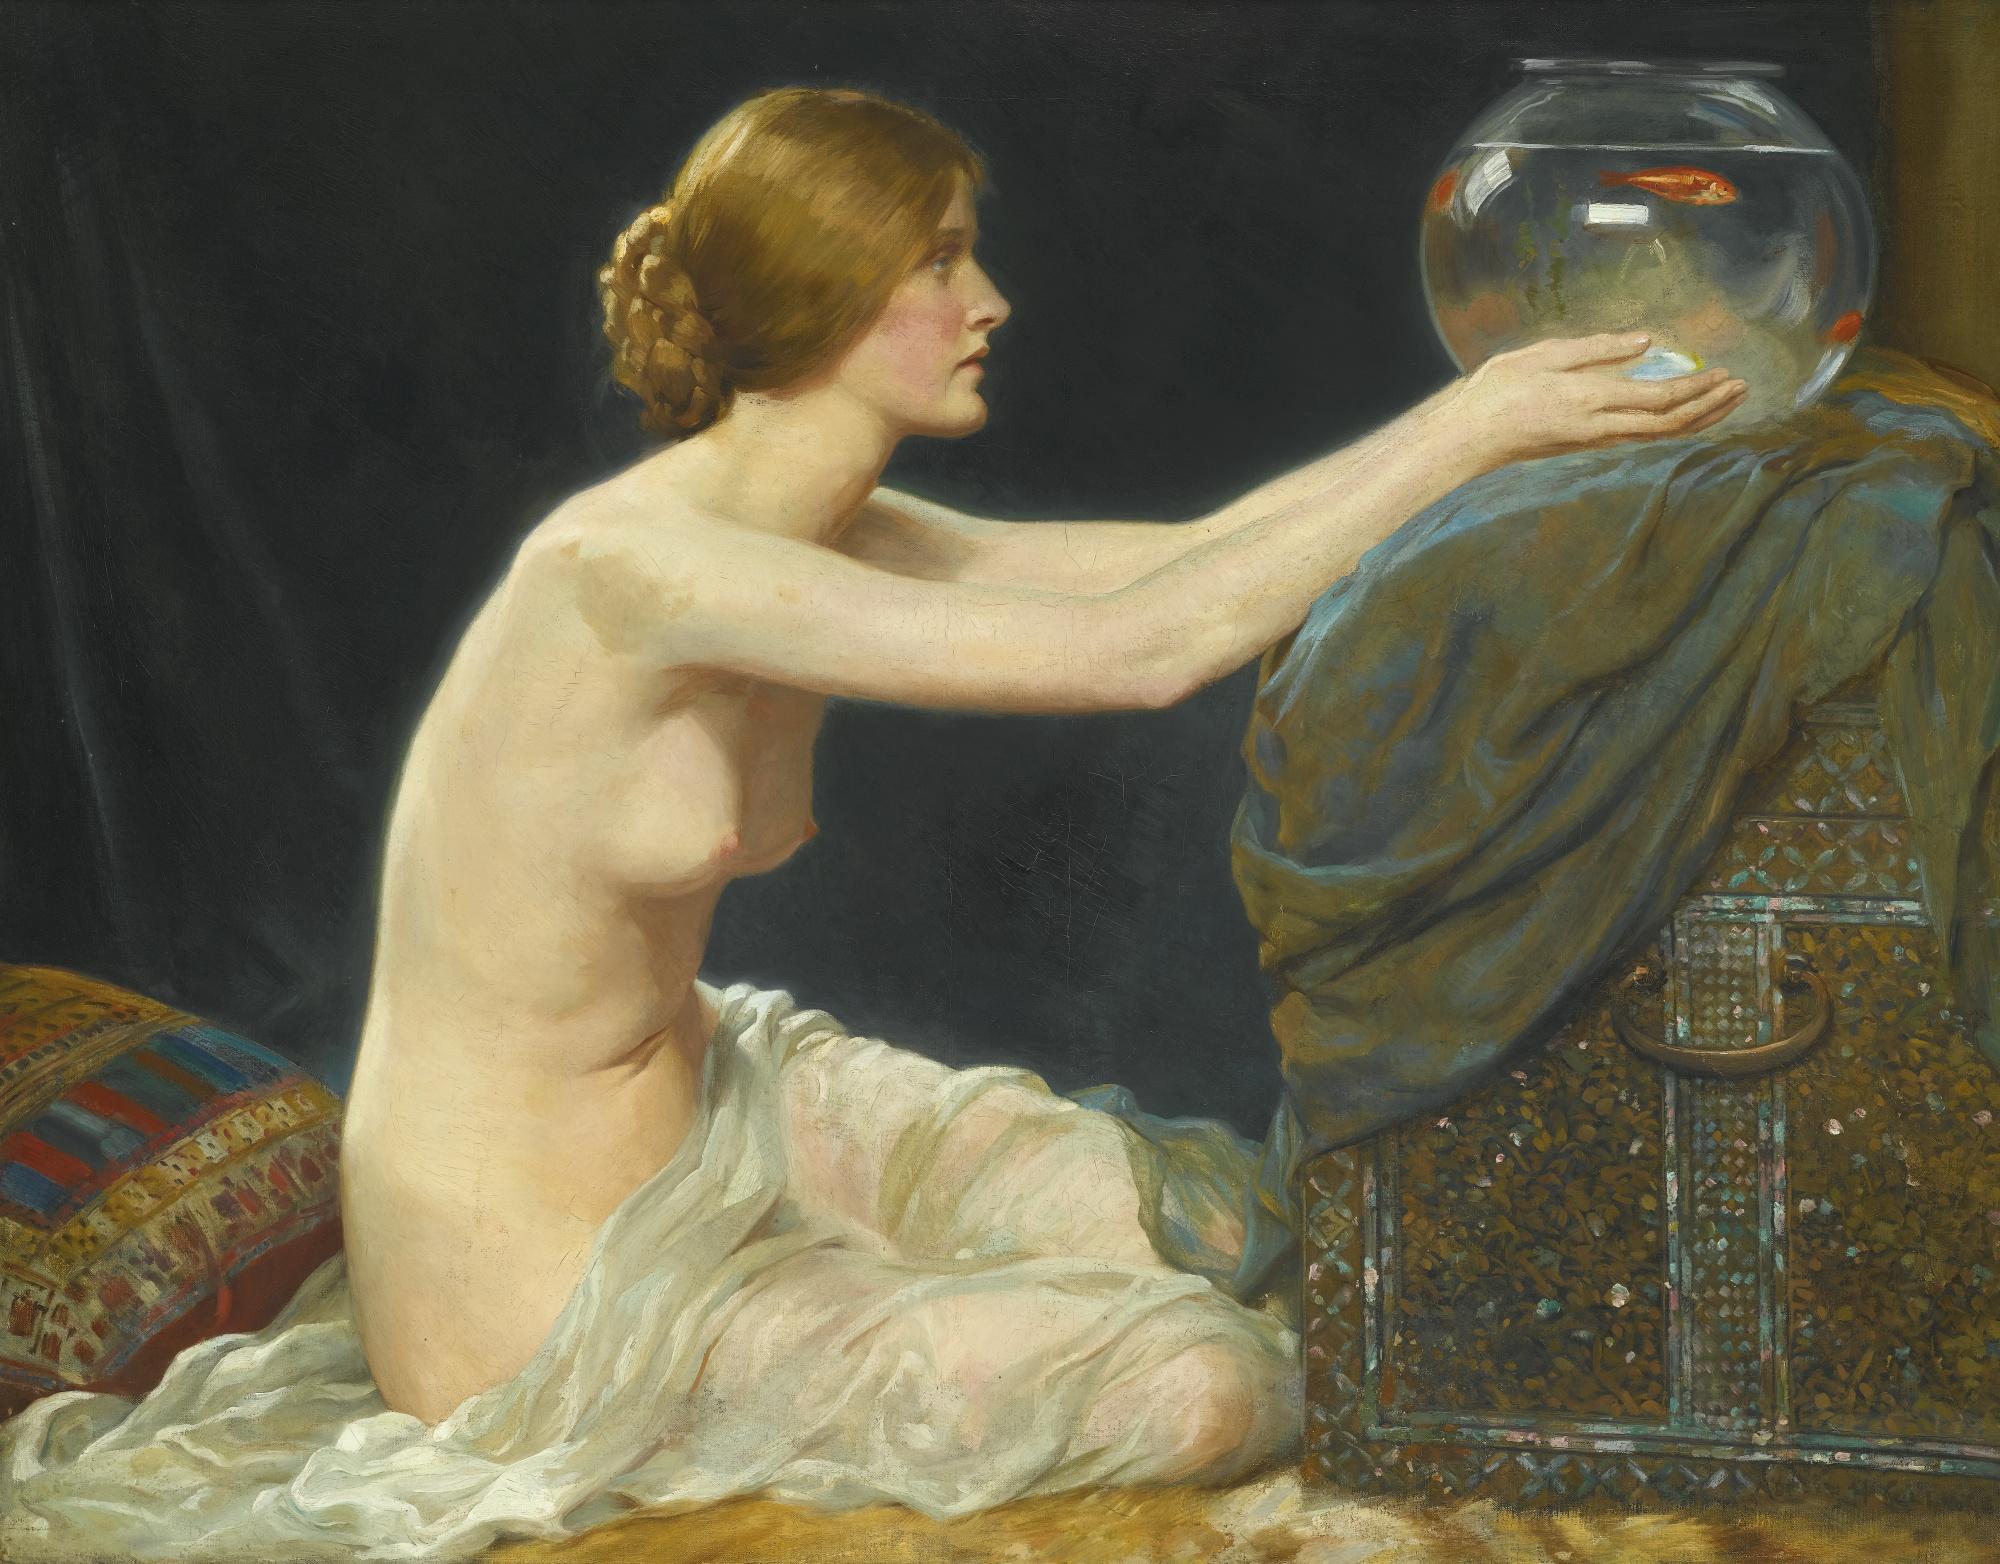 Albert Henry Collings, 1858-1947. Аквариум. 1907. 91.5 х 117 см. Частная коллекция